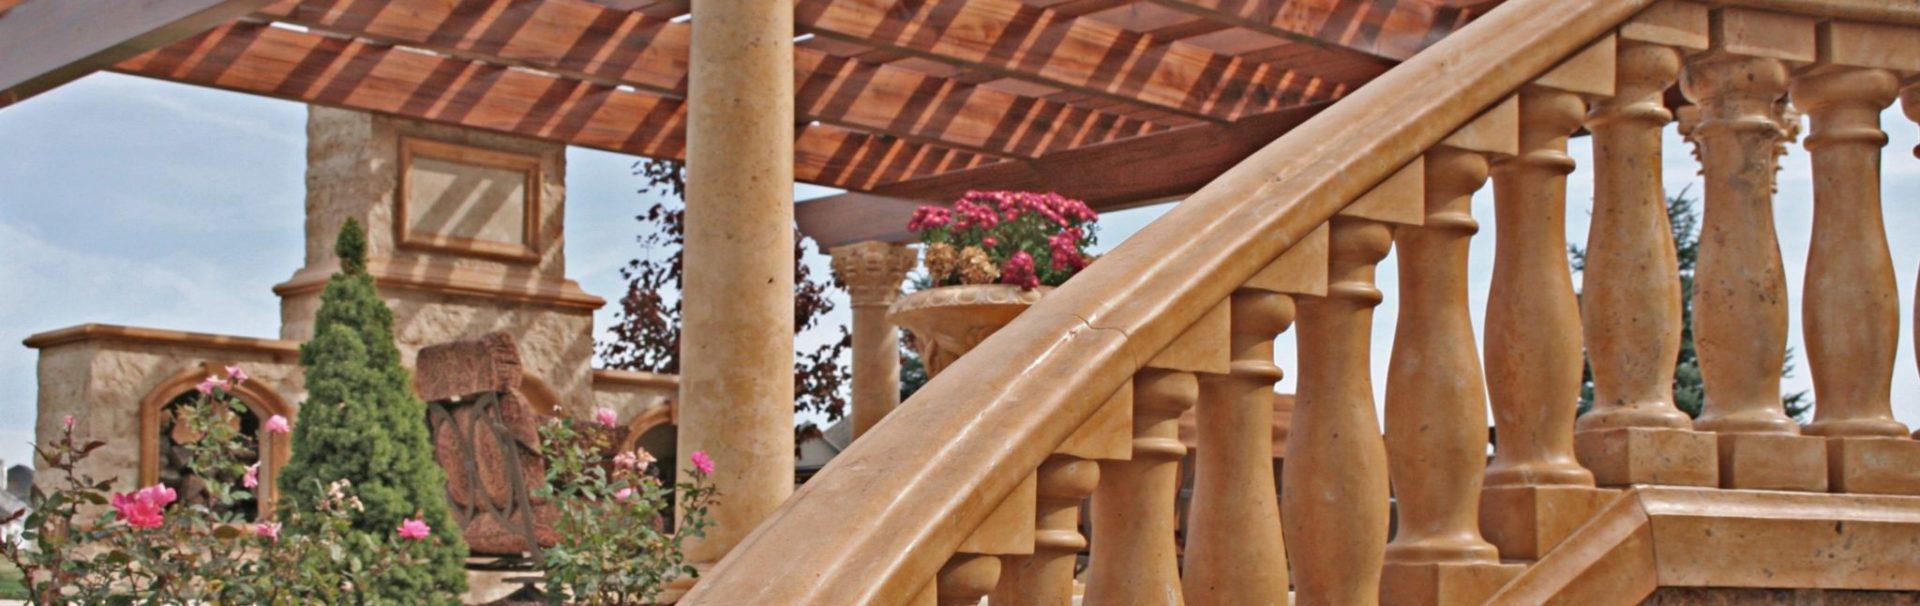 handcarved stone balustrades